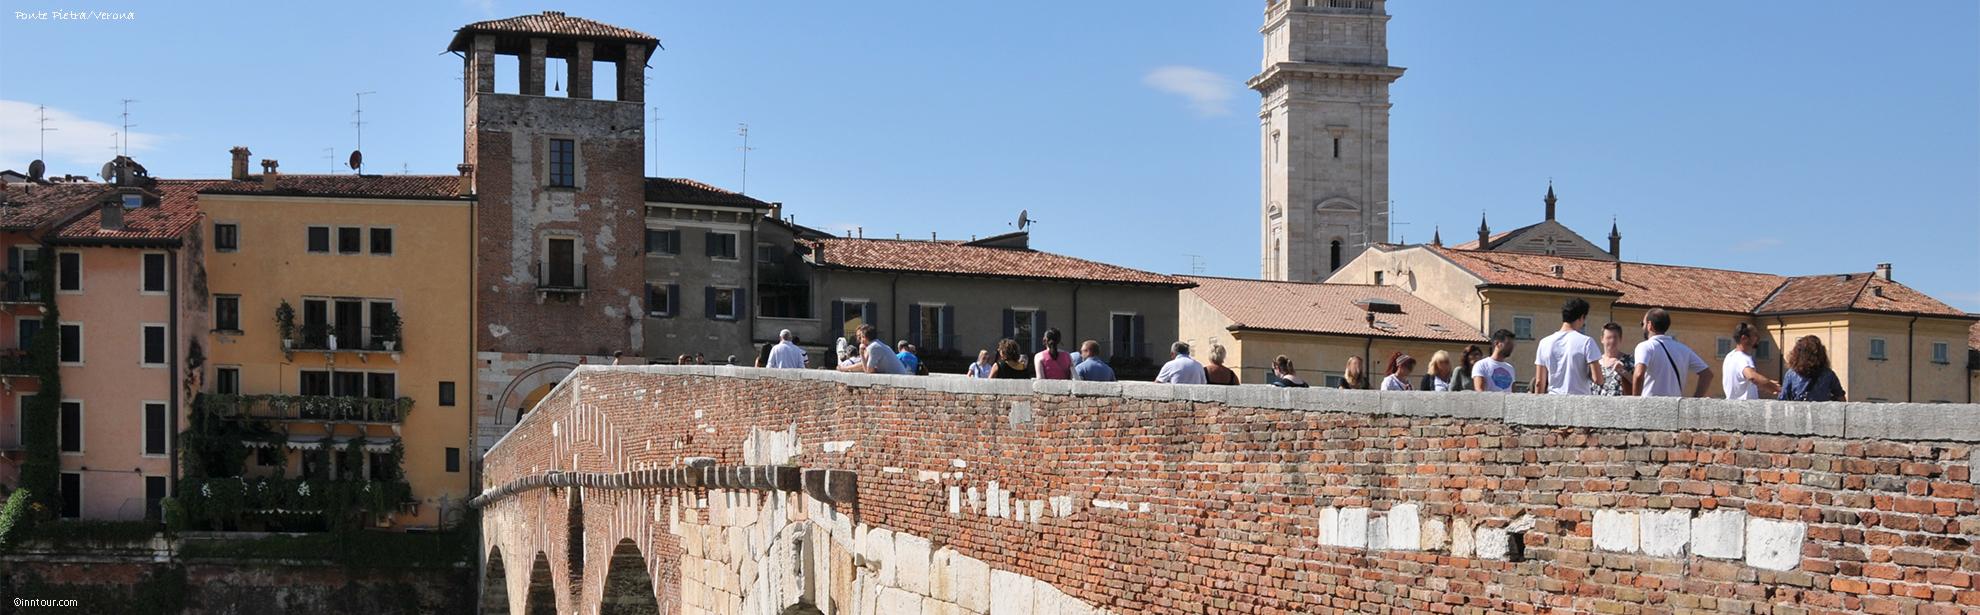 Osportinntour_Ponte-Pietra_Verona_DSC_1009